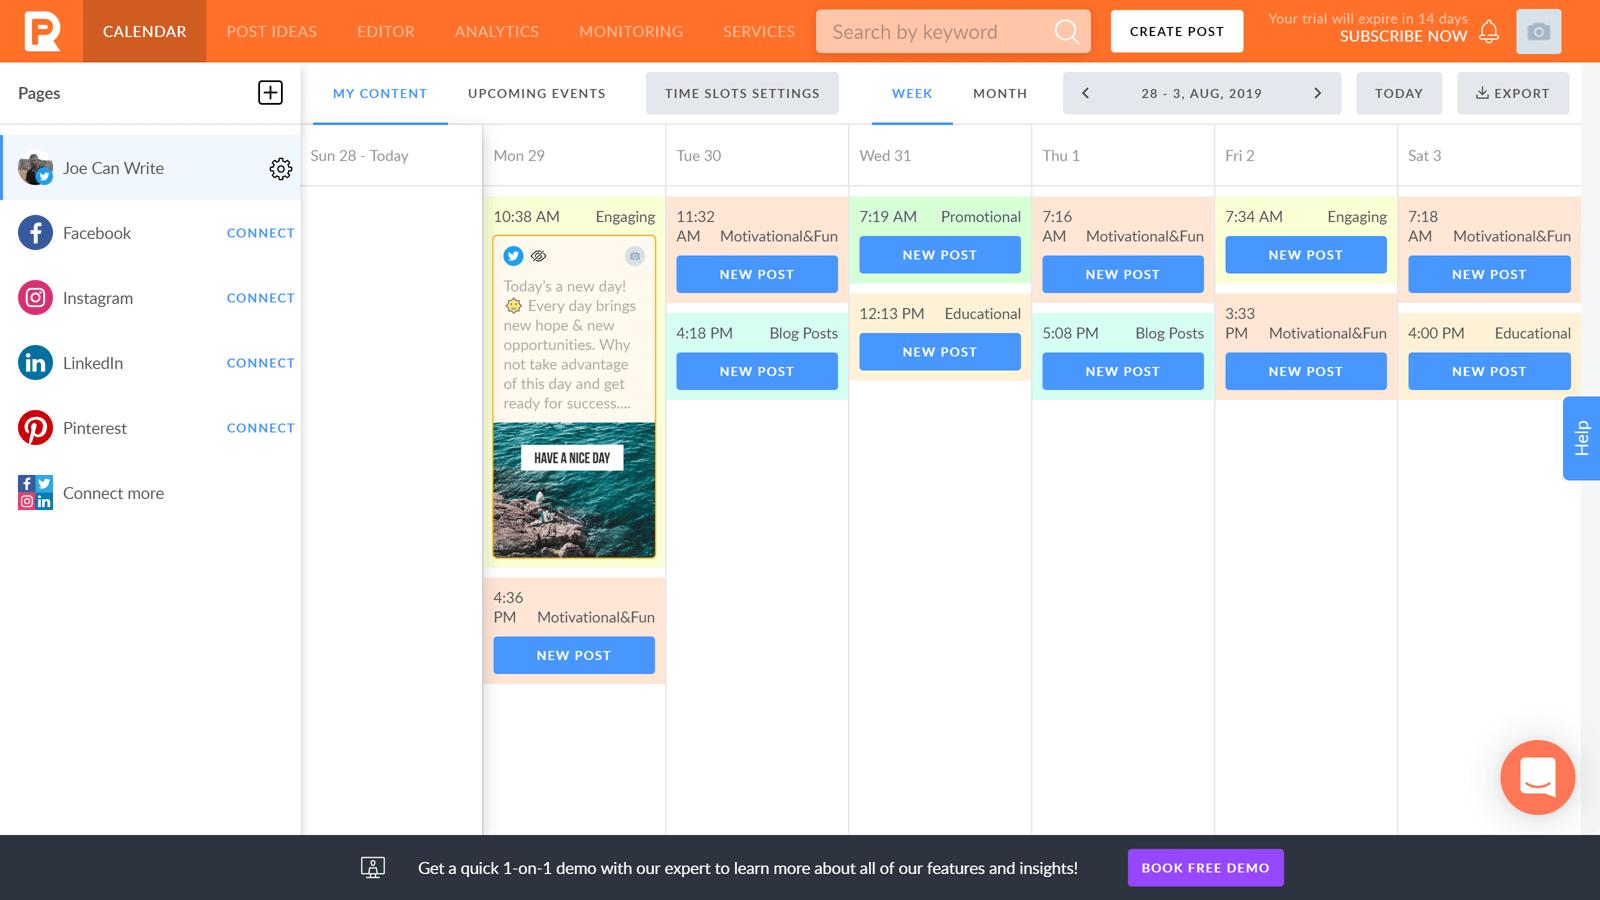 PromoRepublic Calendar